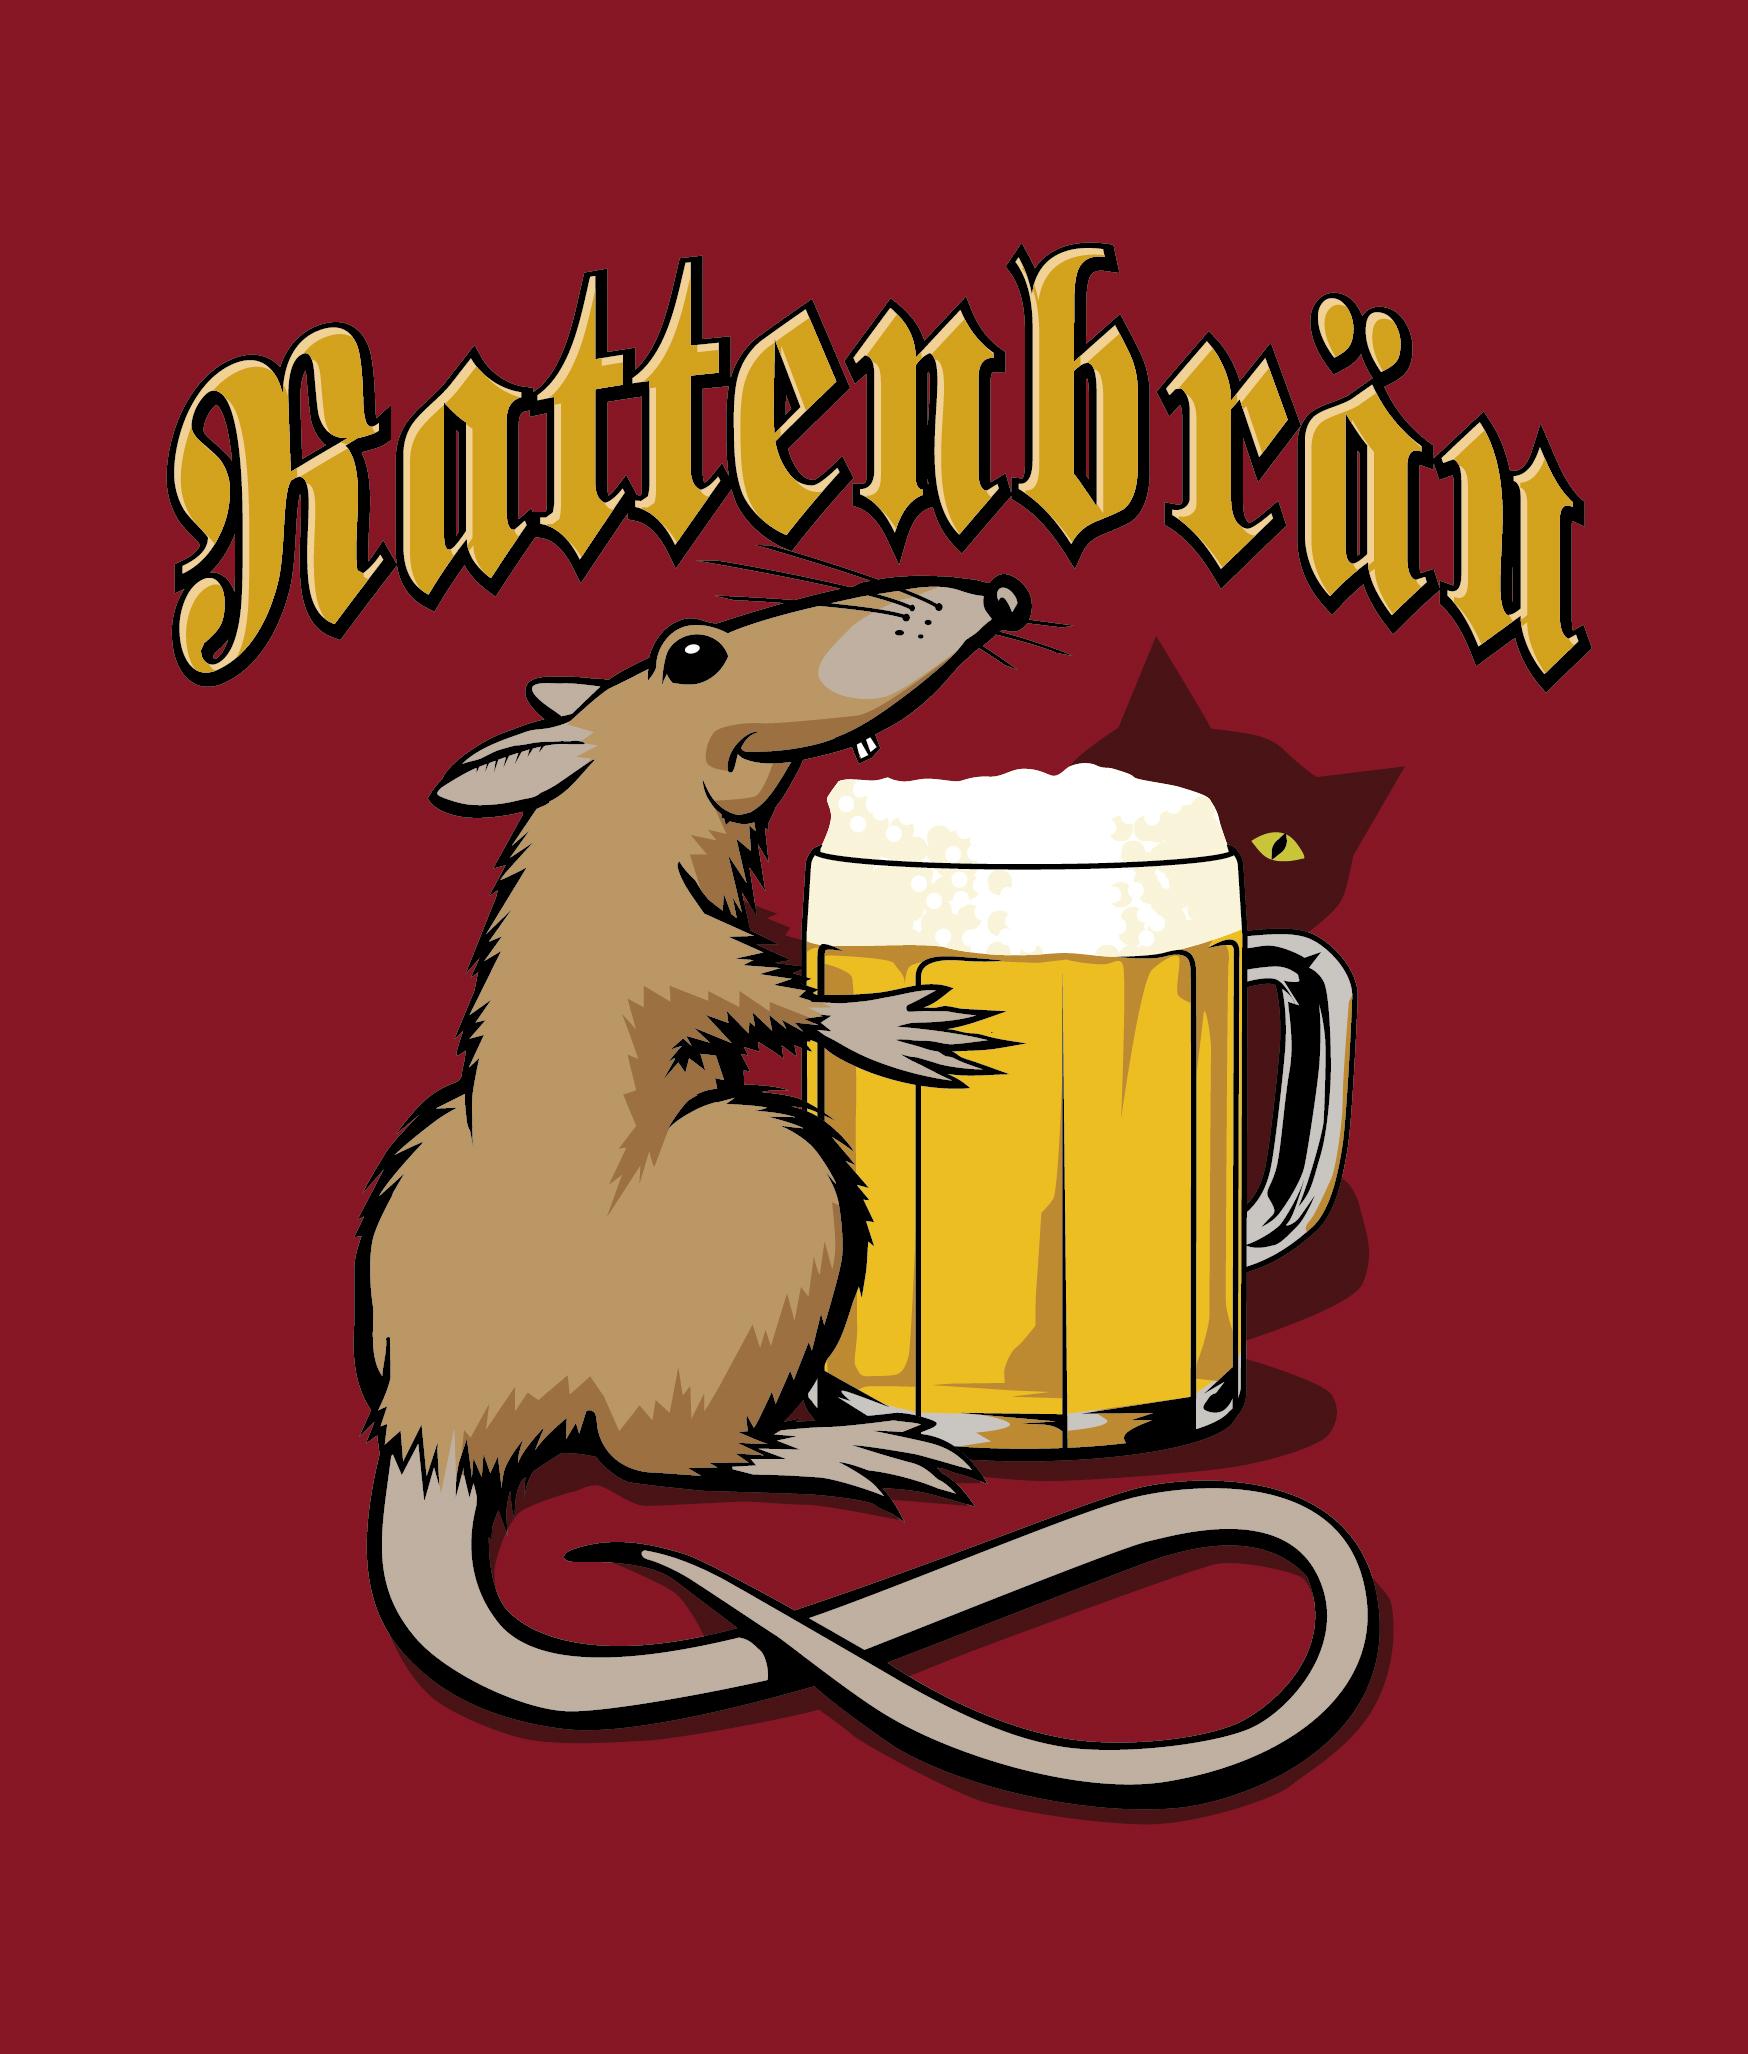 Rattenbräu